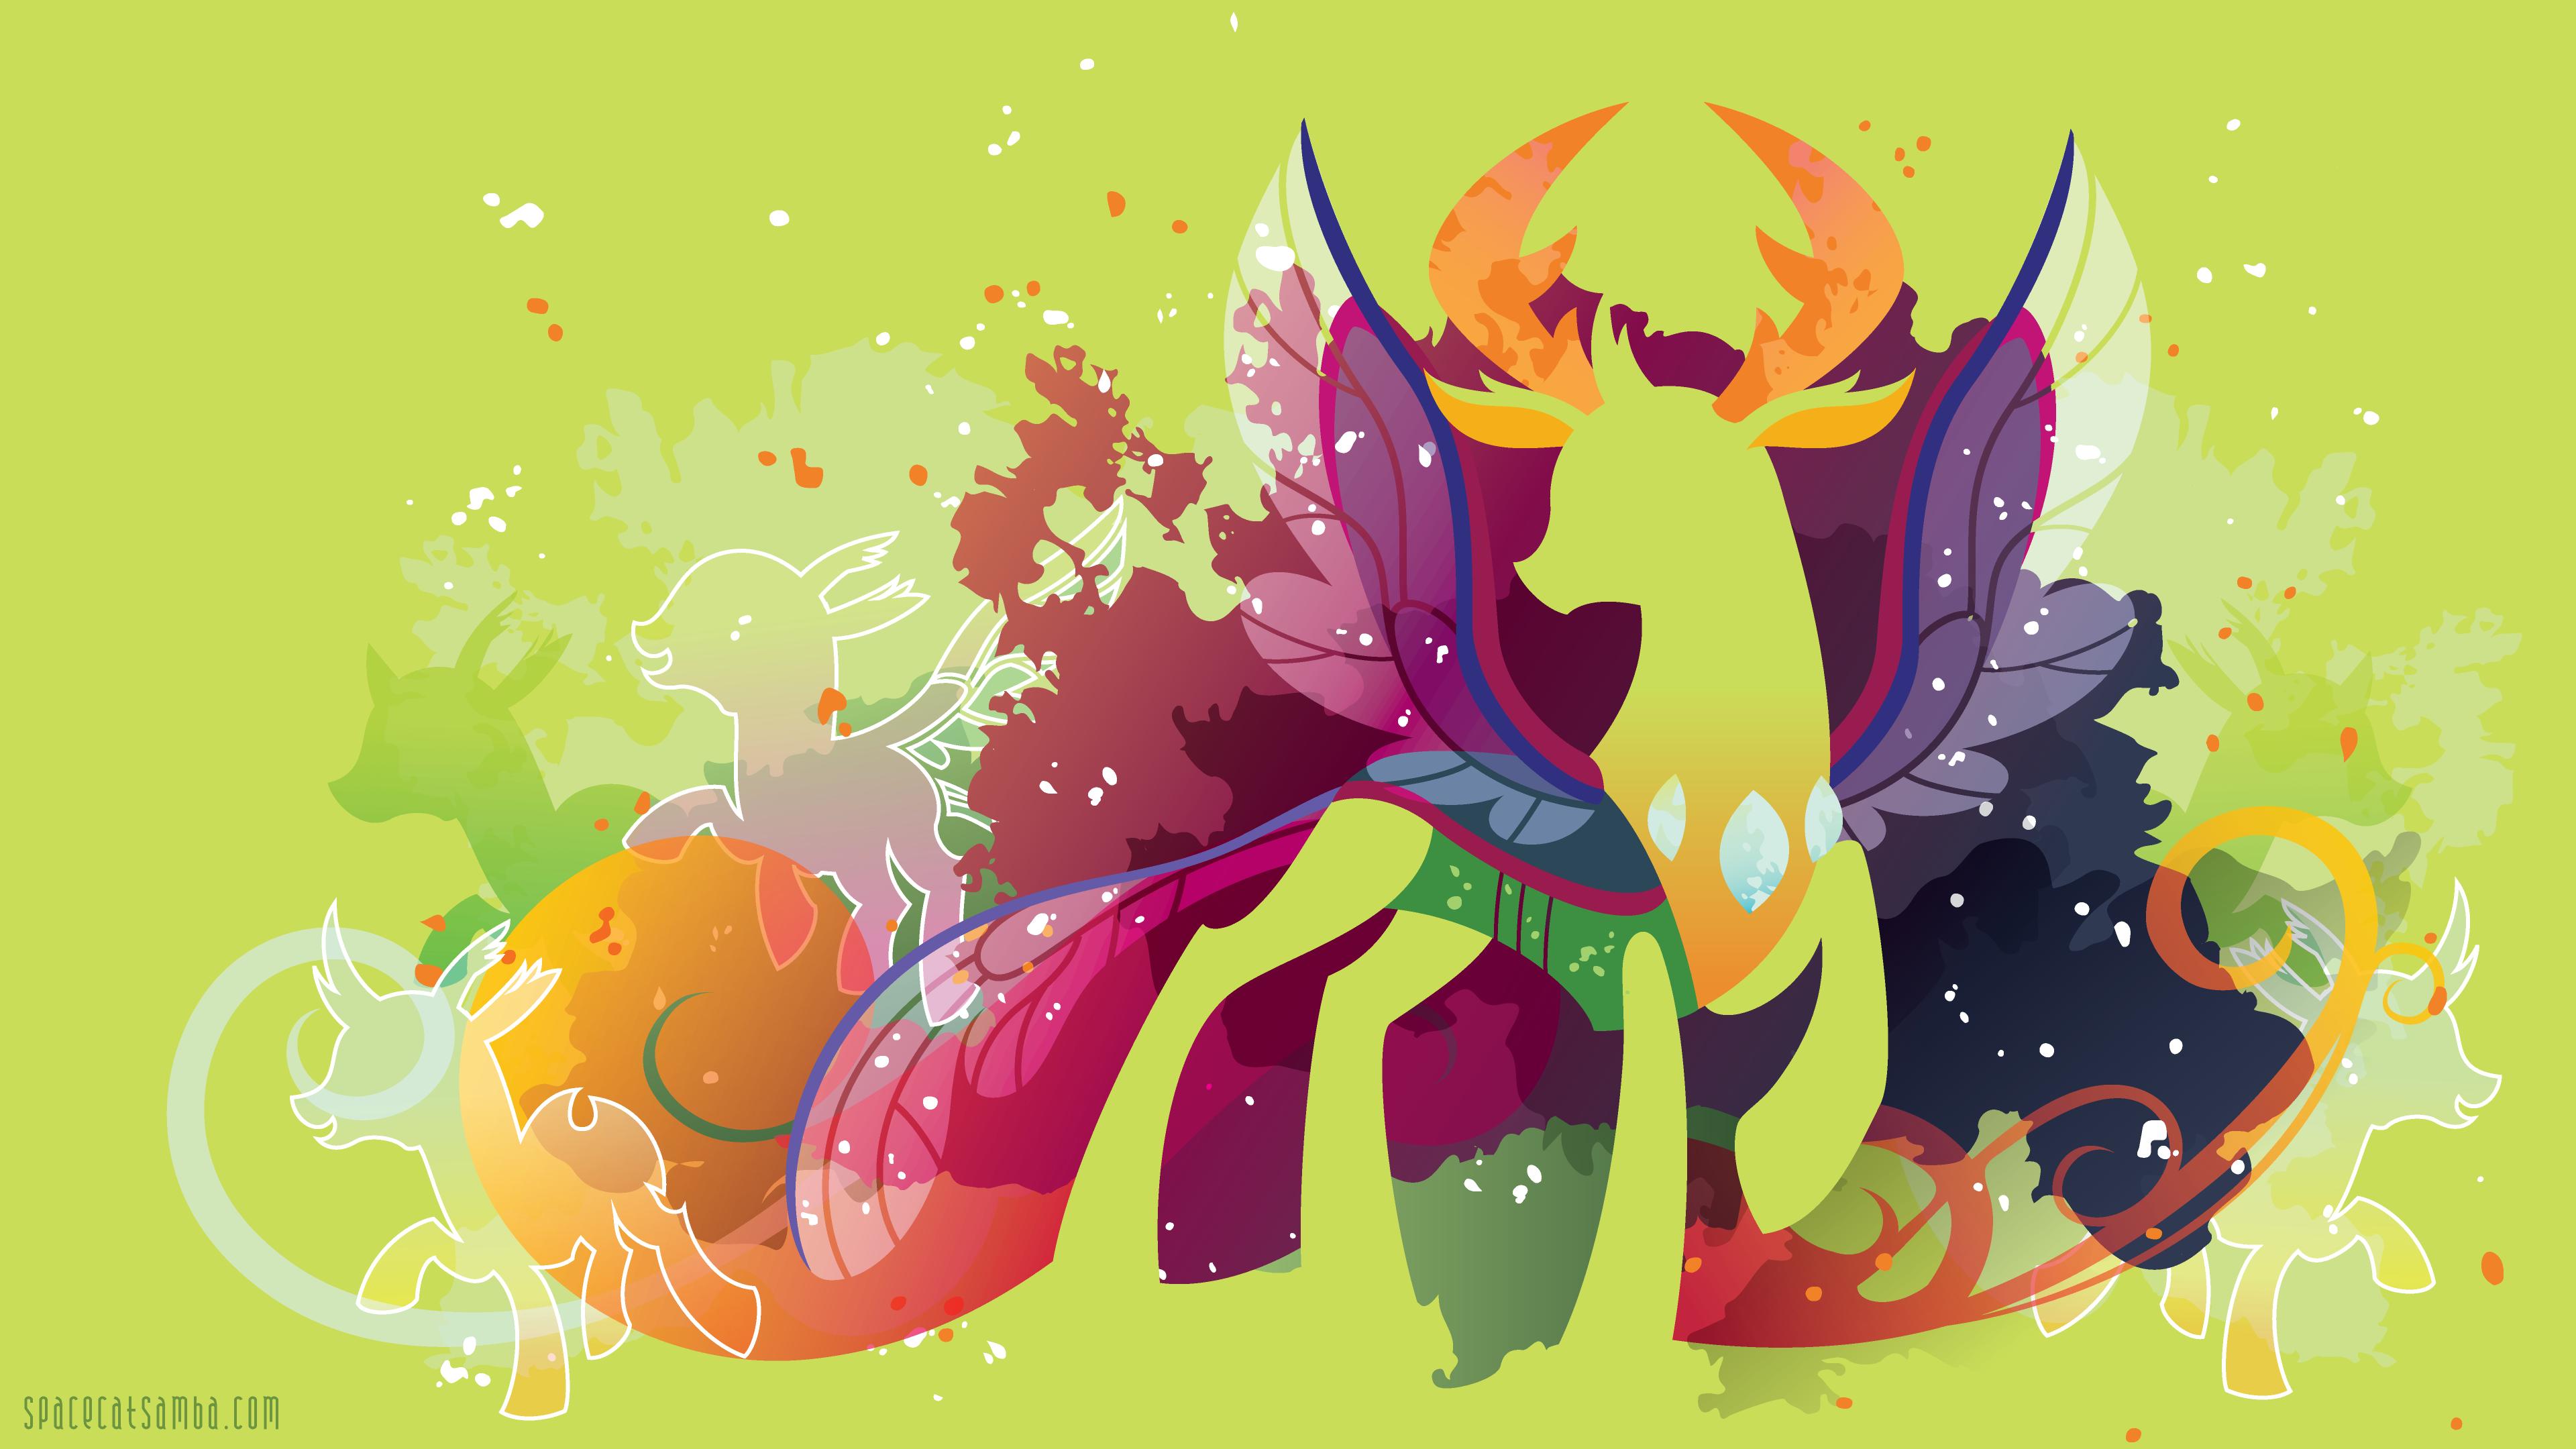 King Thorax My Little Pony Wallpaper Mlp My Little Pony Mlp Pony